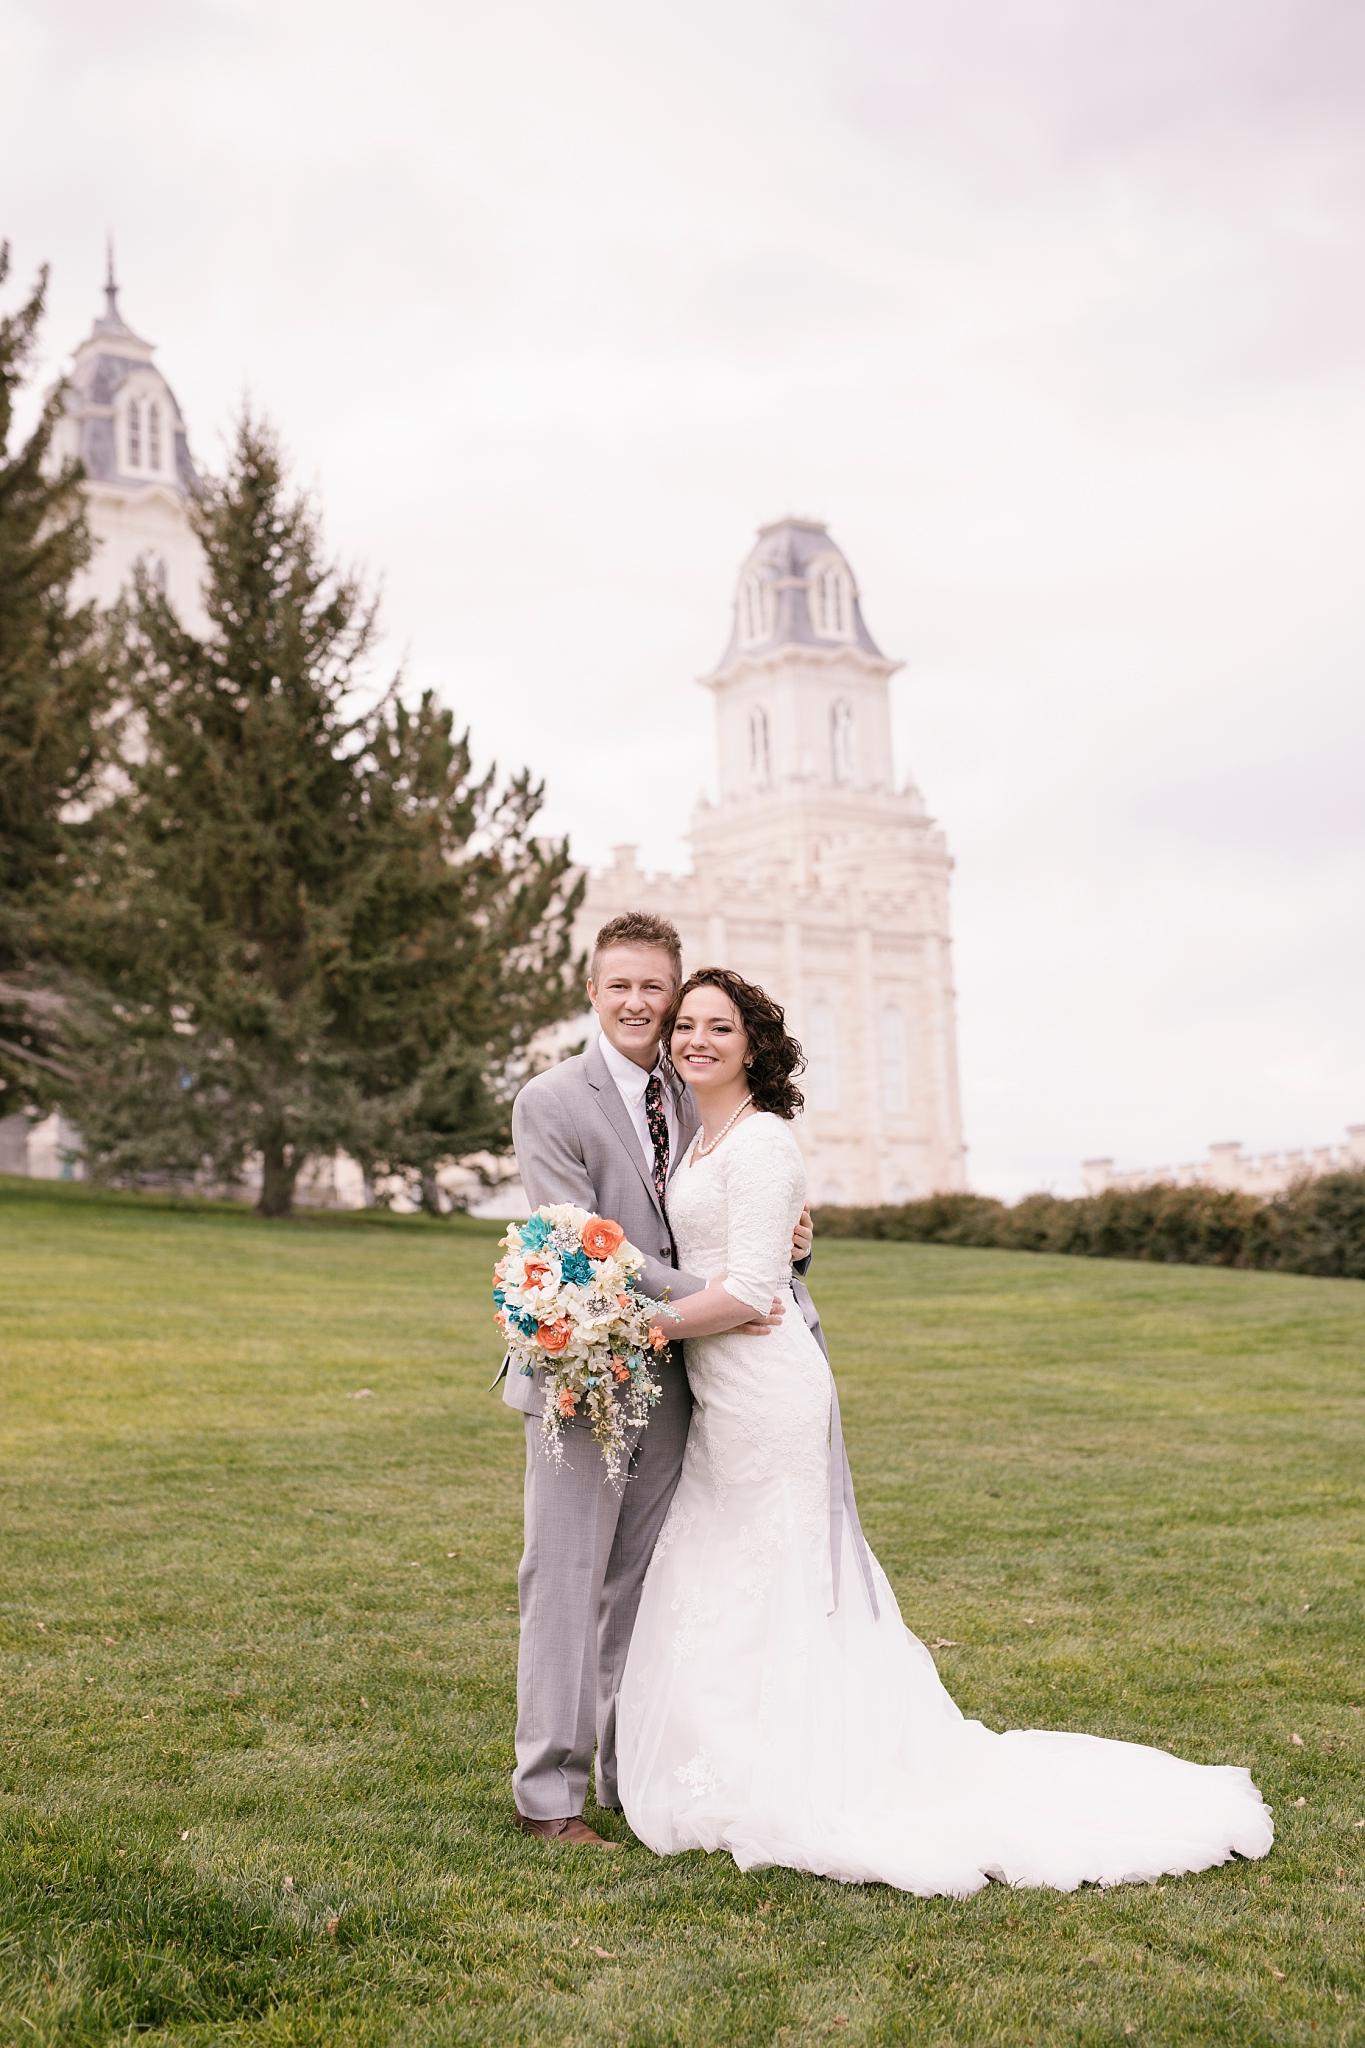 BA-Bridals-42_Lizzie-B-Imagery-Utah-Wedding-Photographer-Engagement-Photography-Salt-Lake-City-Park-City-Utah-County-Manti-Utah-Temple.jpg